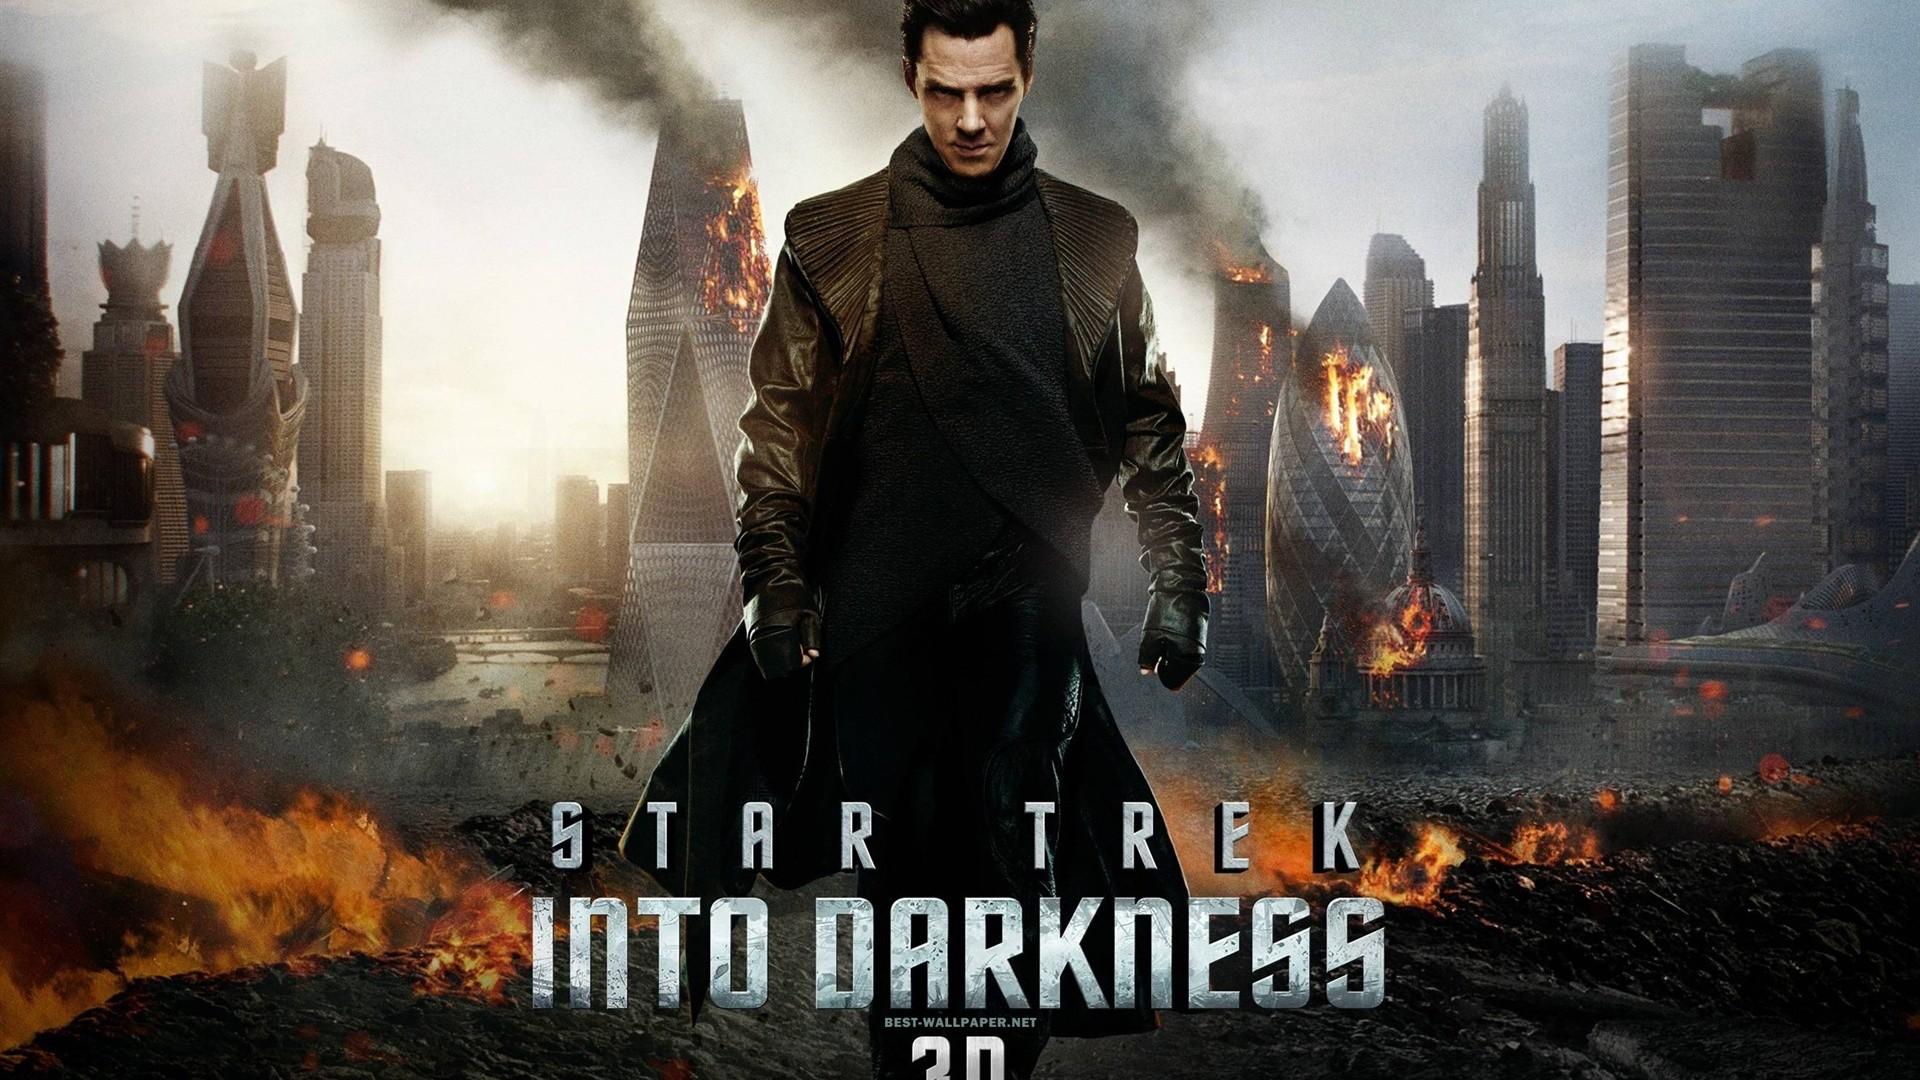 Star Trek Into Darkness Cast